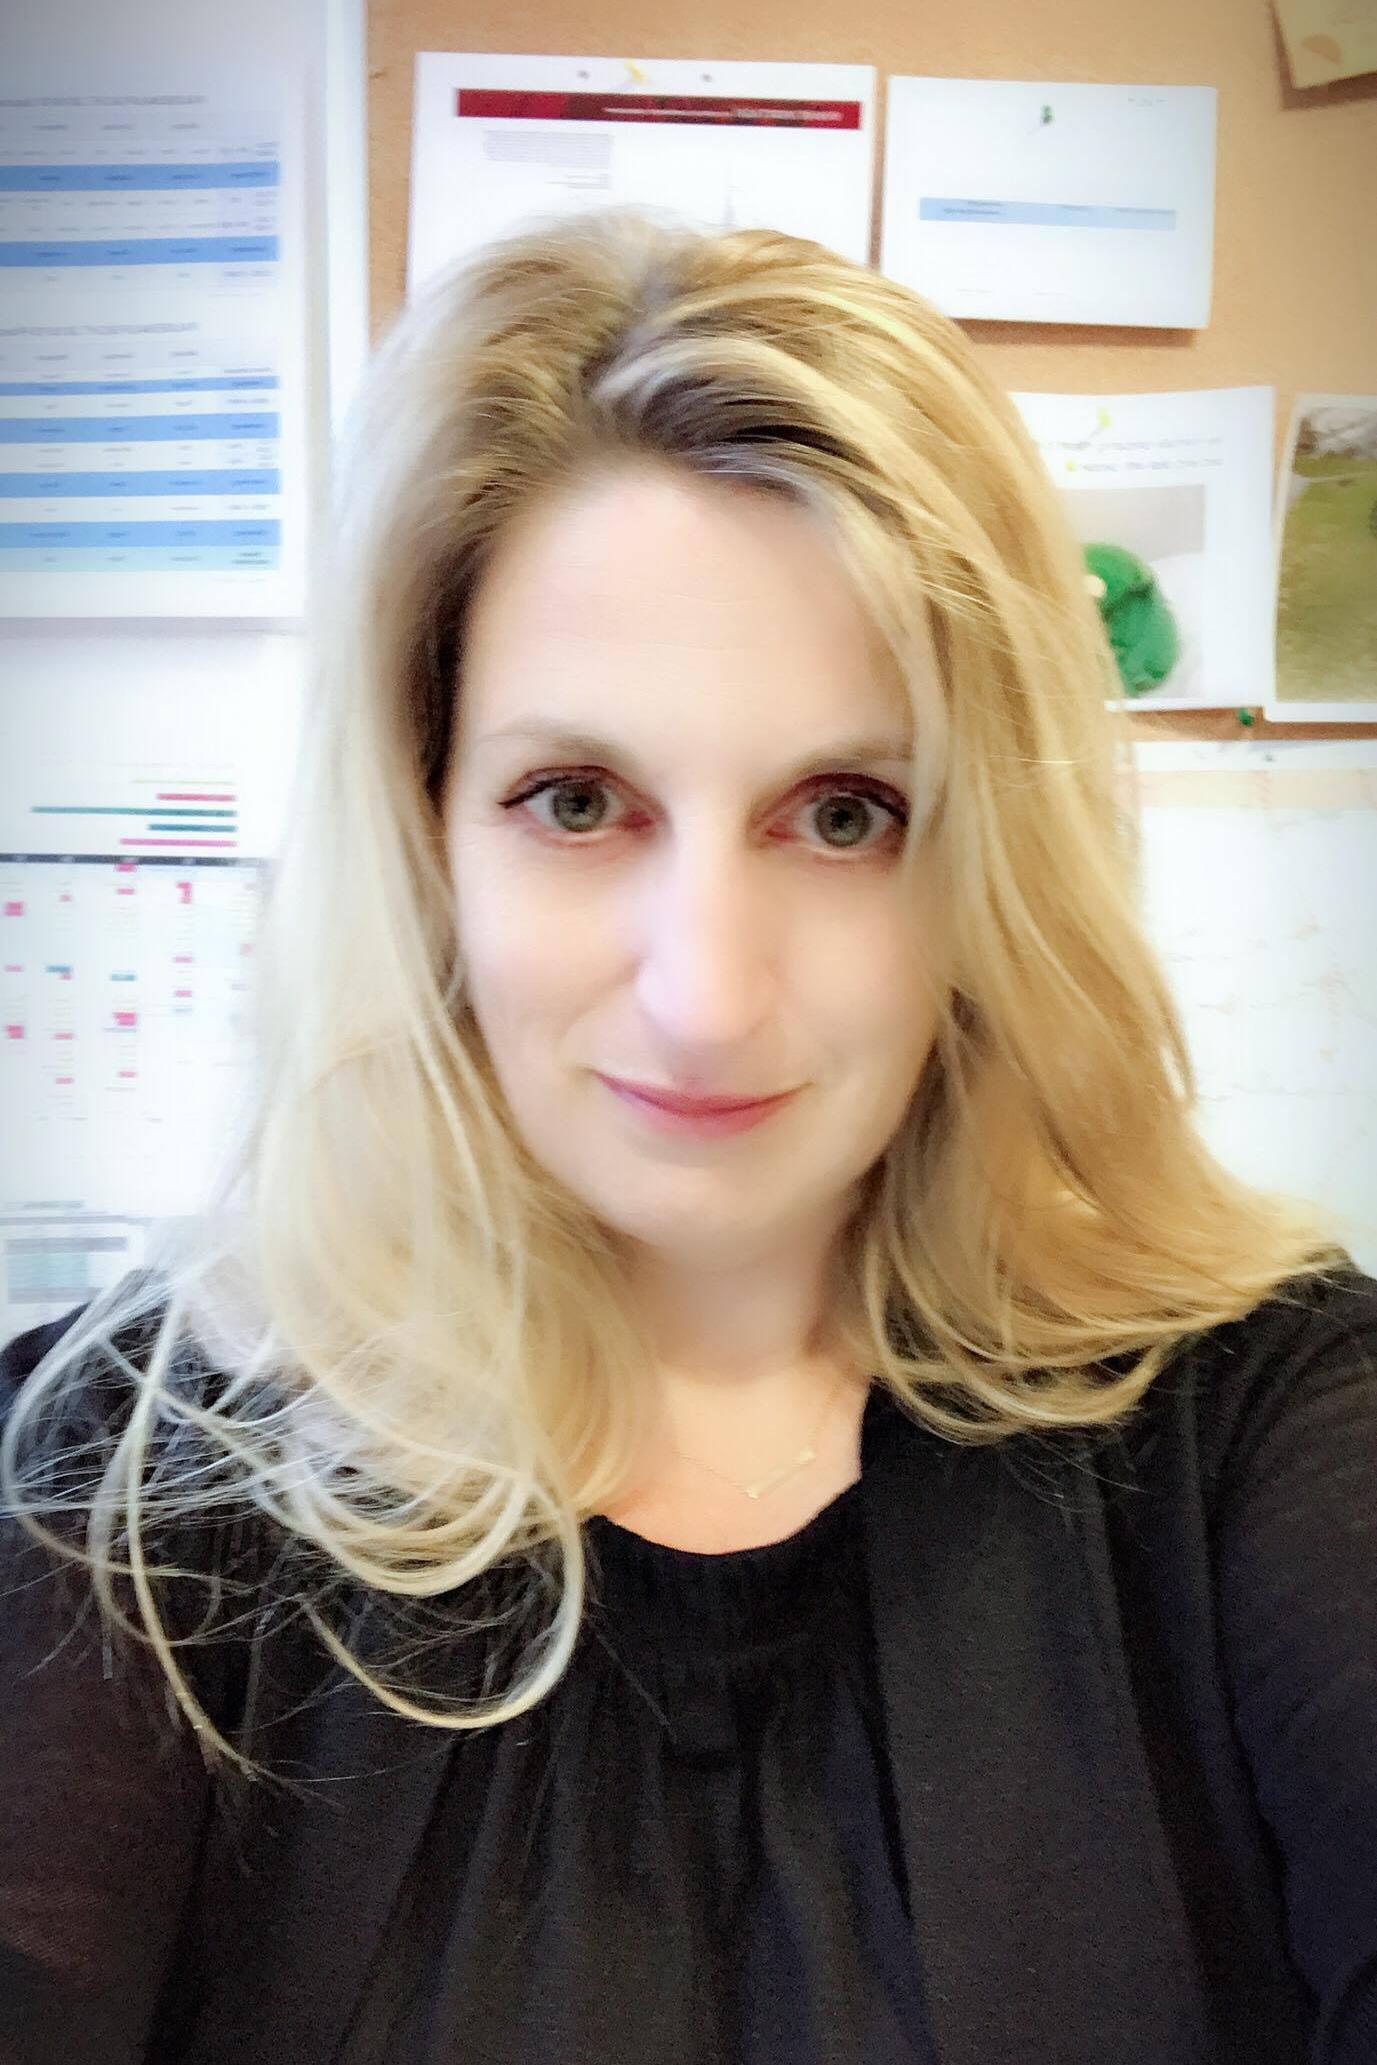 Koordinator Videregående skole - Katharina SchlichtherleTel: 96 94 85 11Send e-post